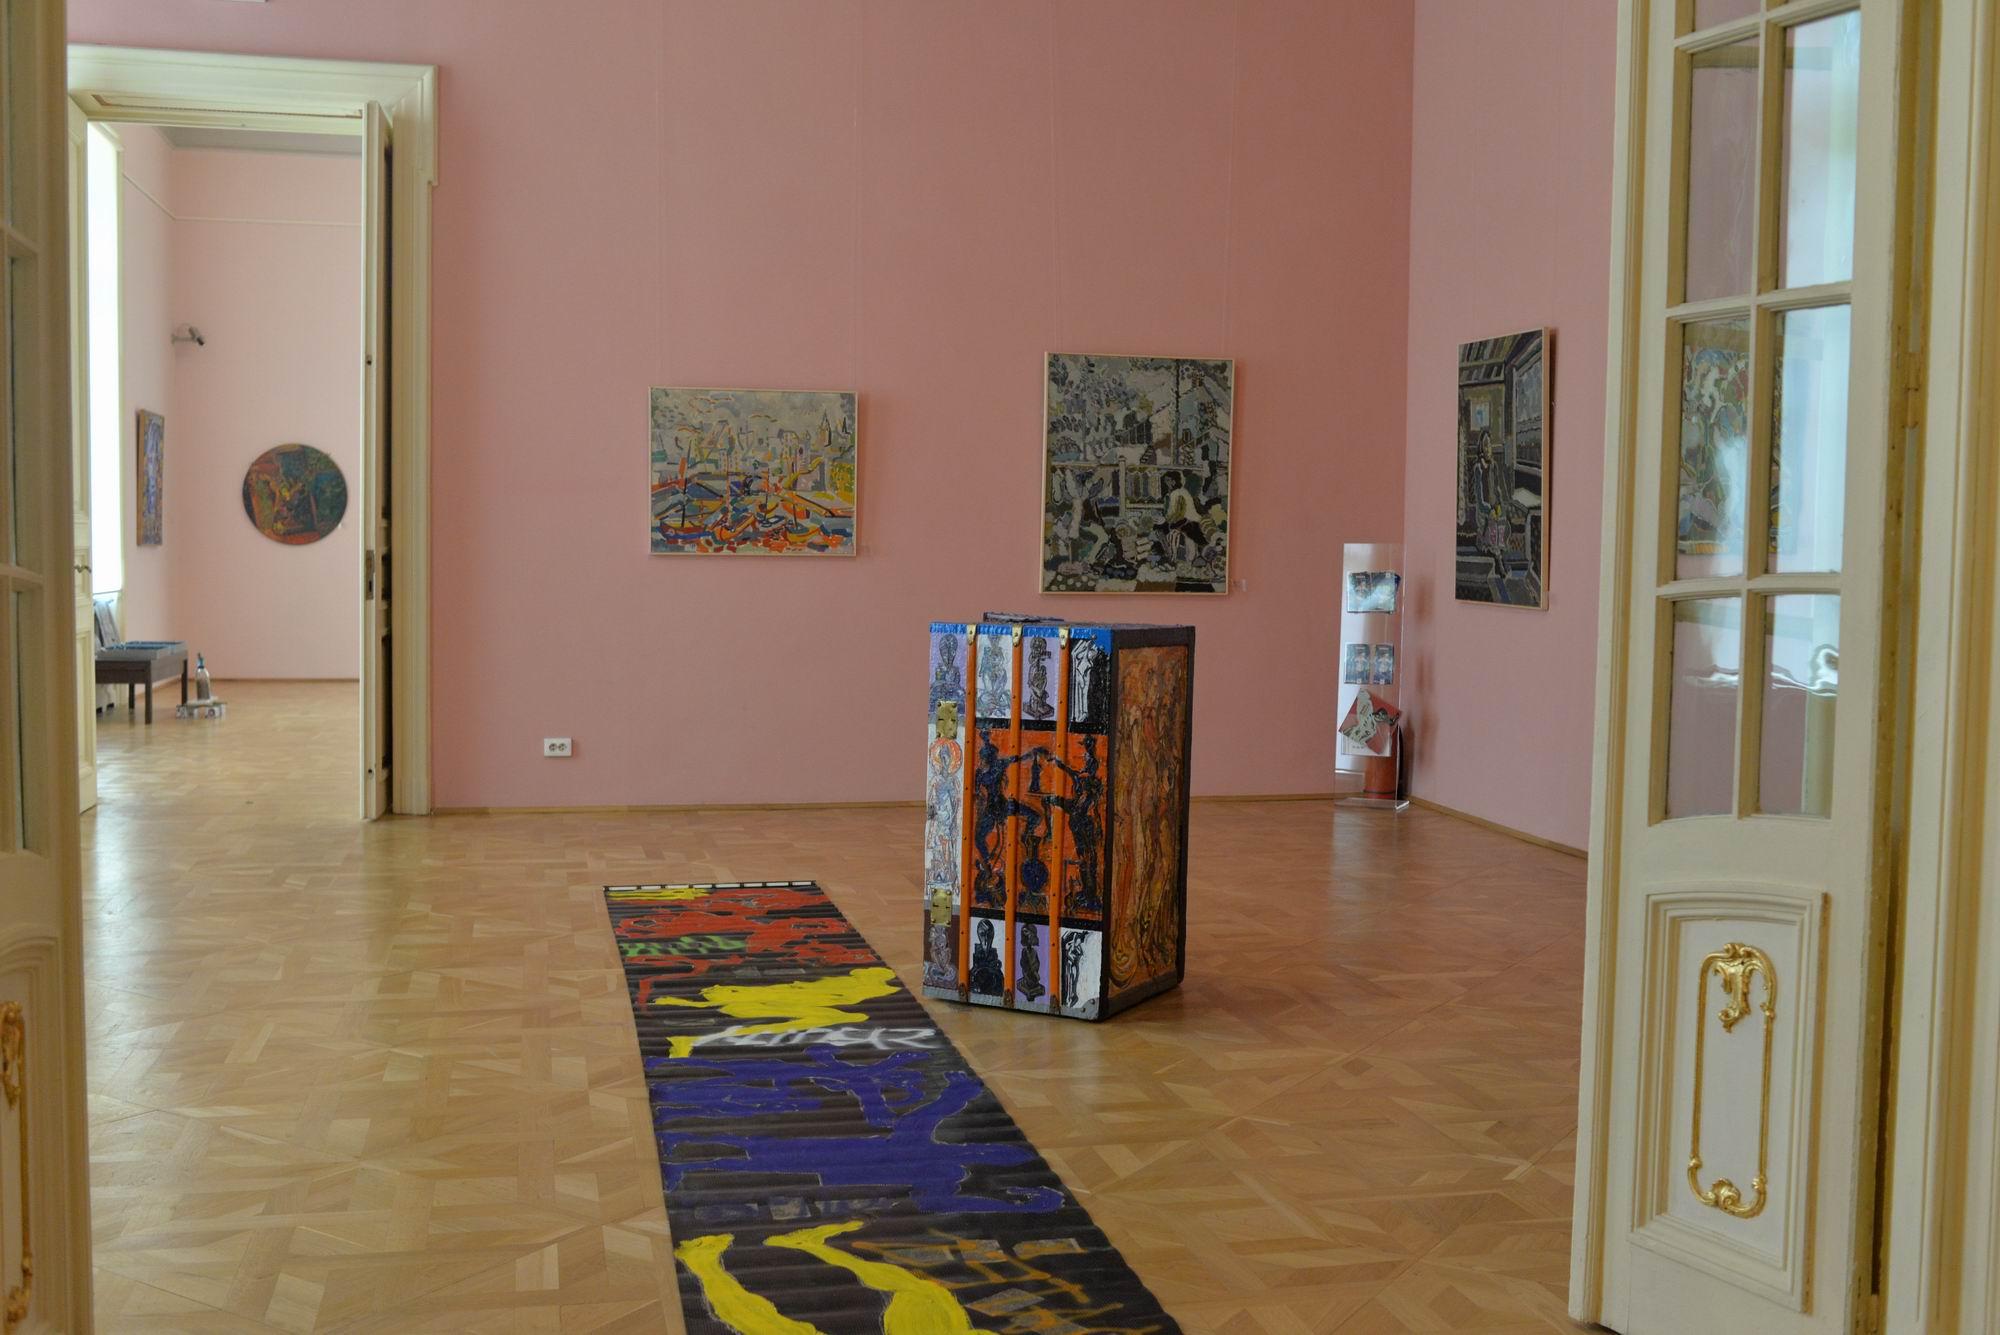 Mihail Trifan - Muzeul de Arta Craiova  LM_0014